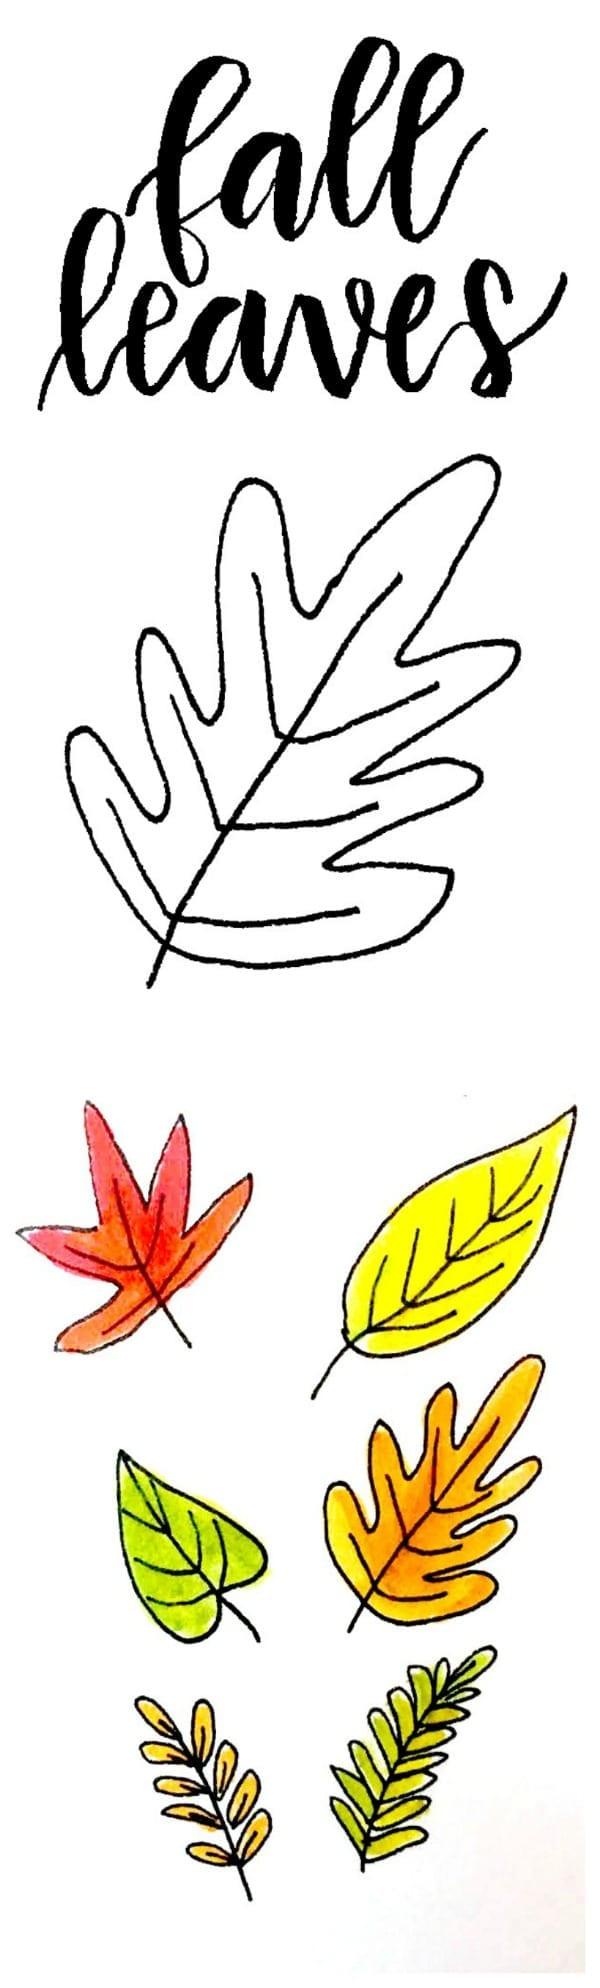 Hand Drawn Fall Leaves